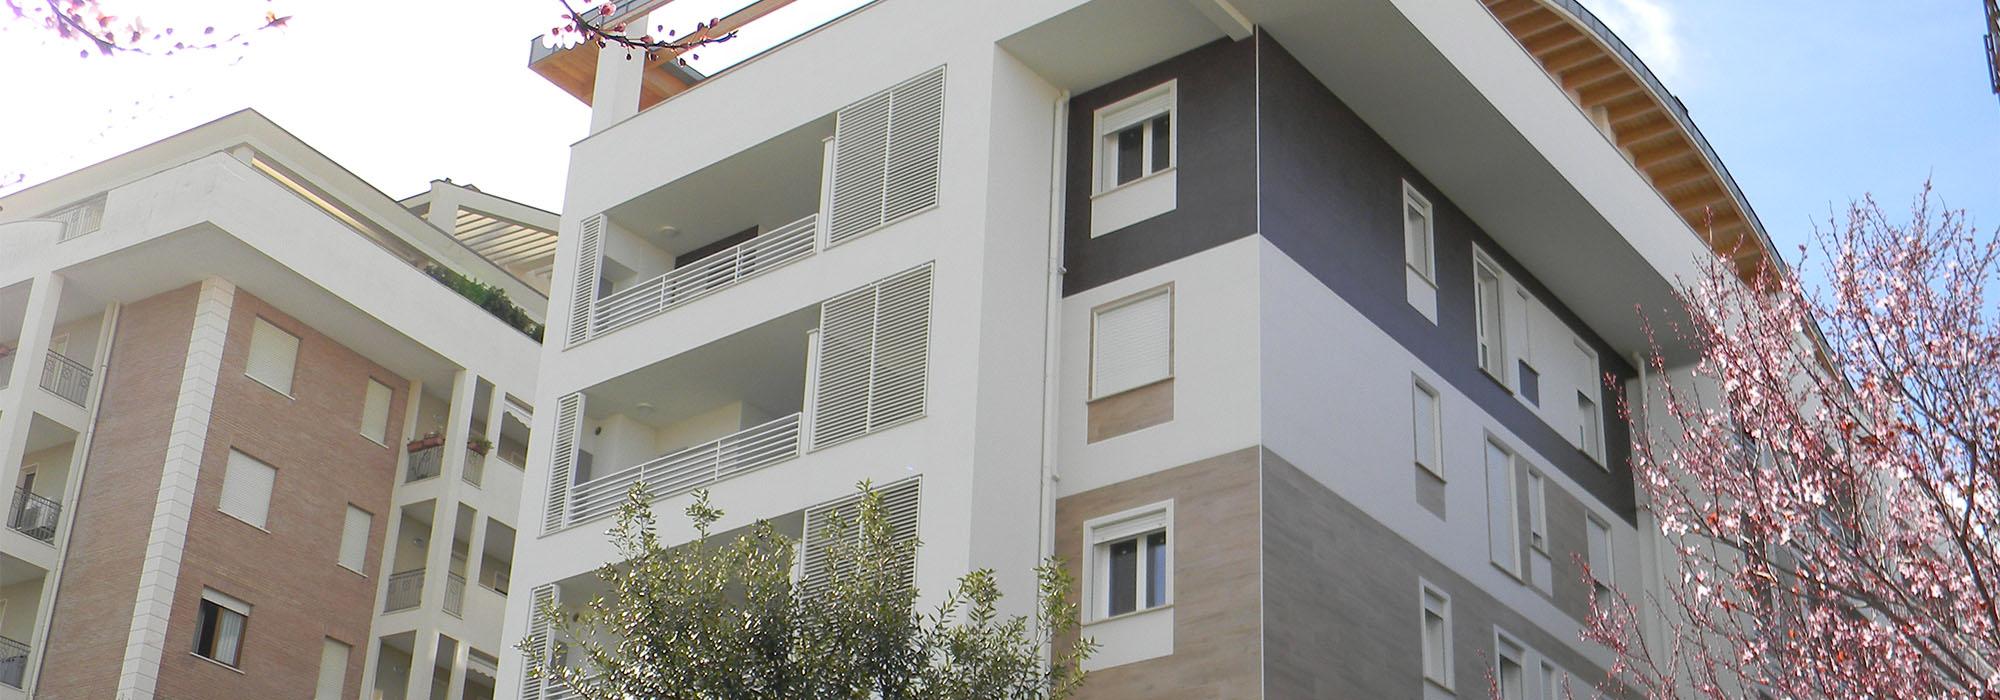 Residenza 46 – Via Carlo Felice 46 Sassari